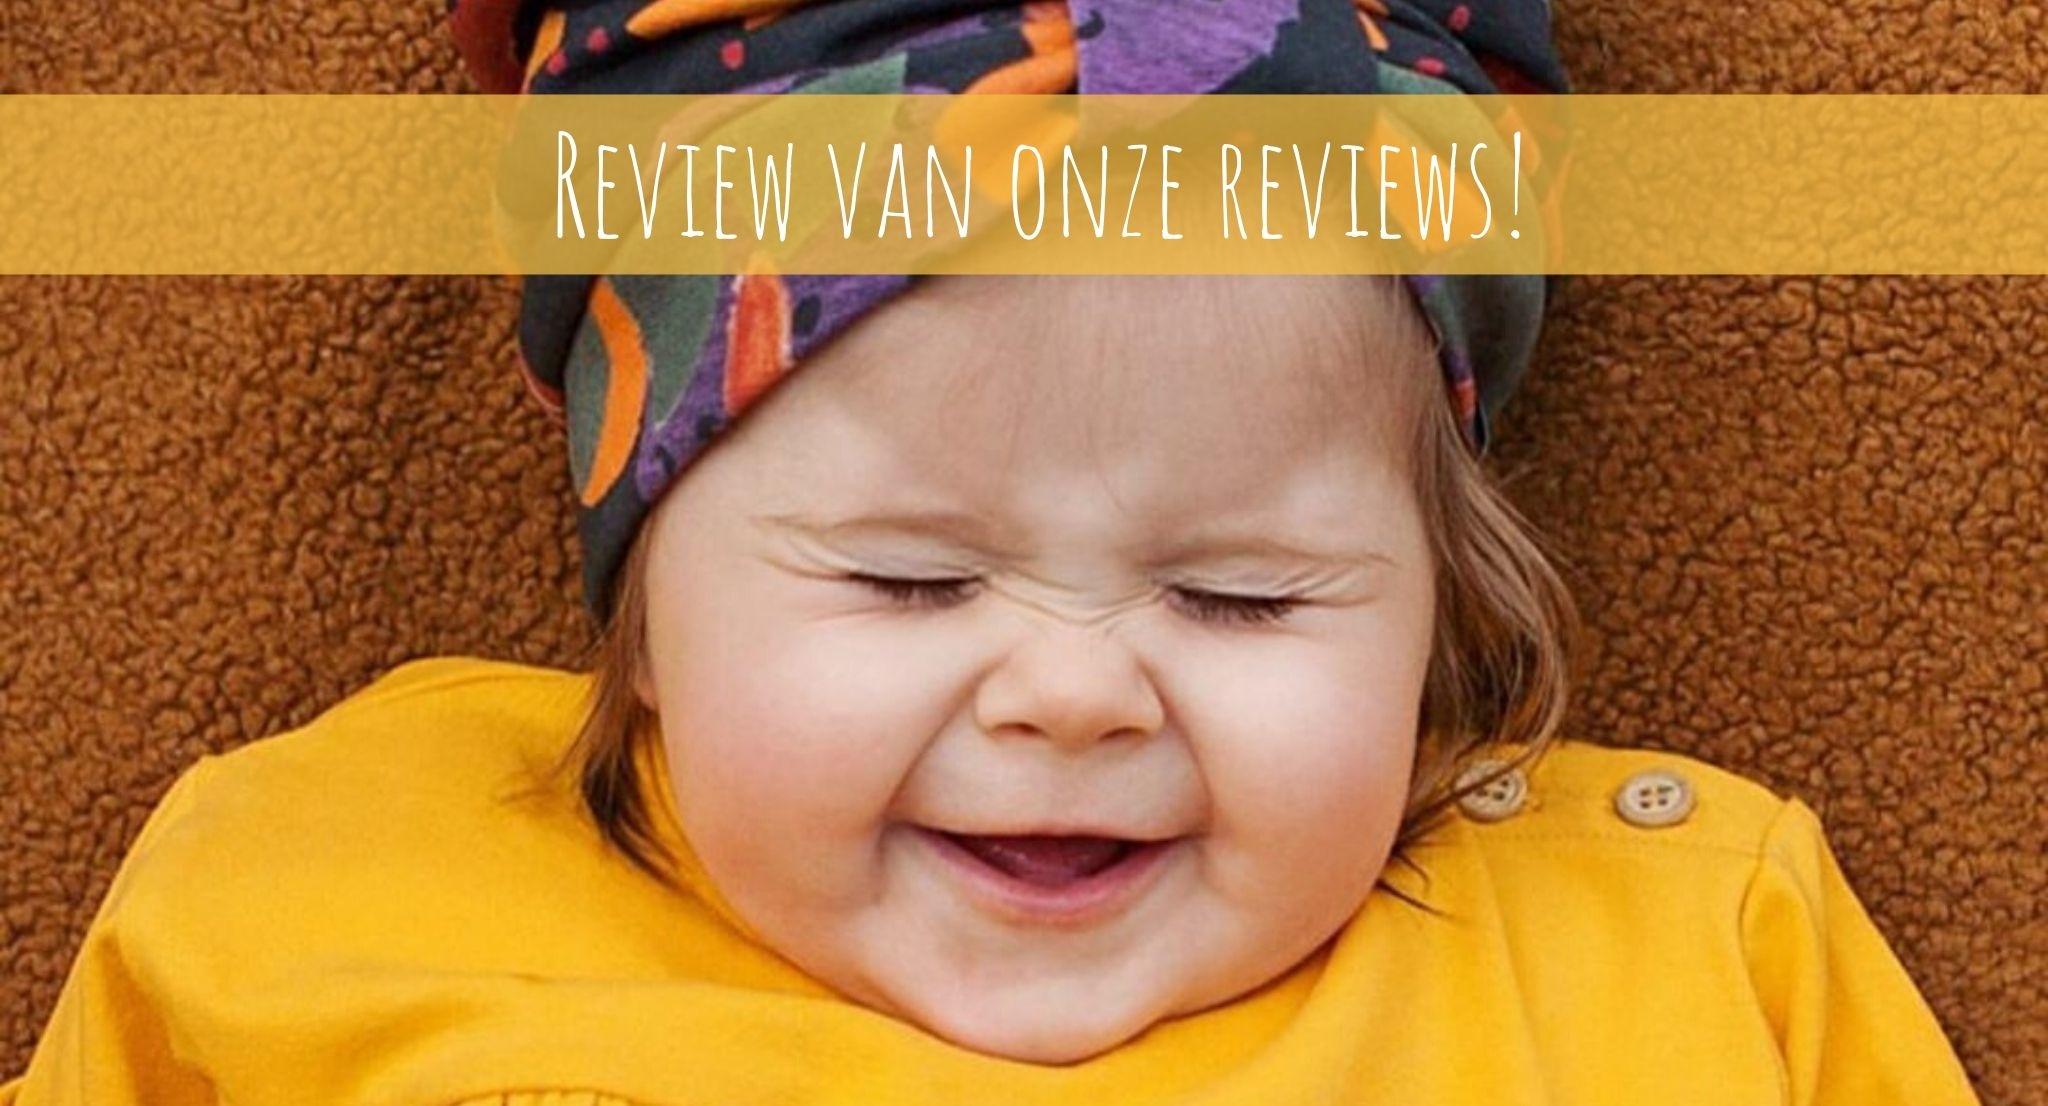 Review van onze reviews